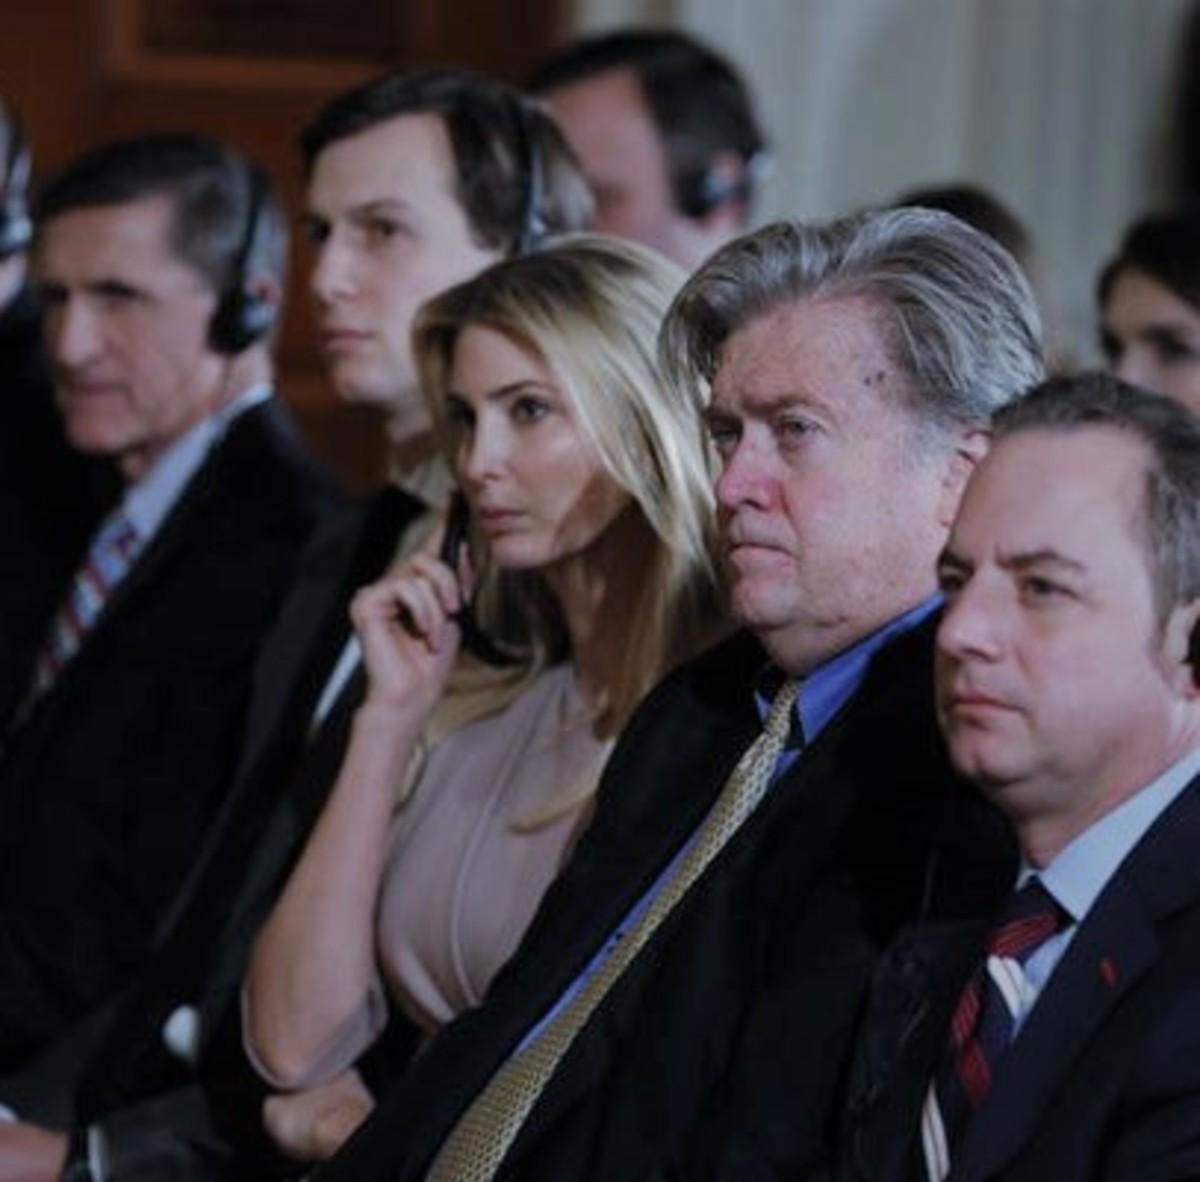 Flynn, Kushner, Trump, Bannon, Priebus